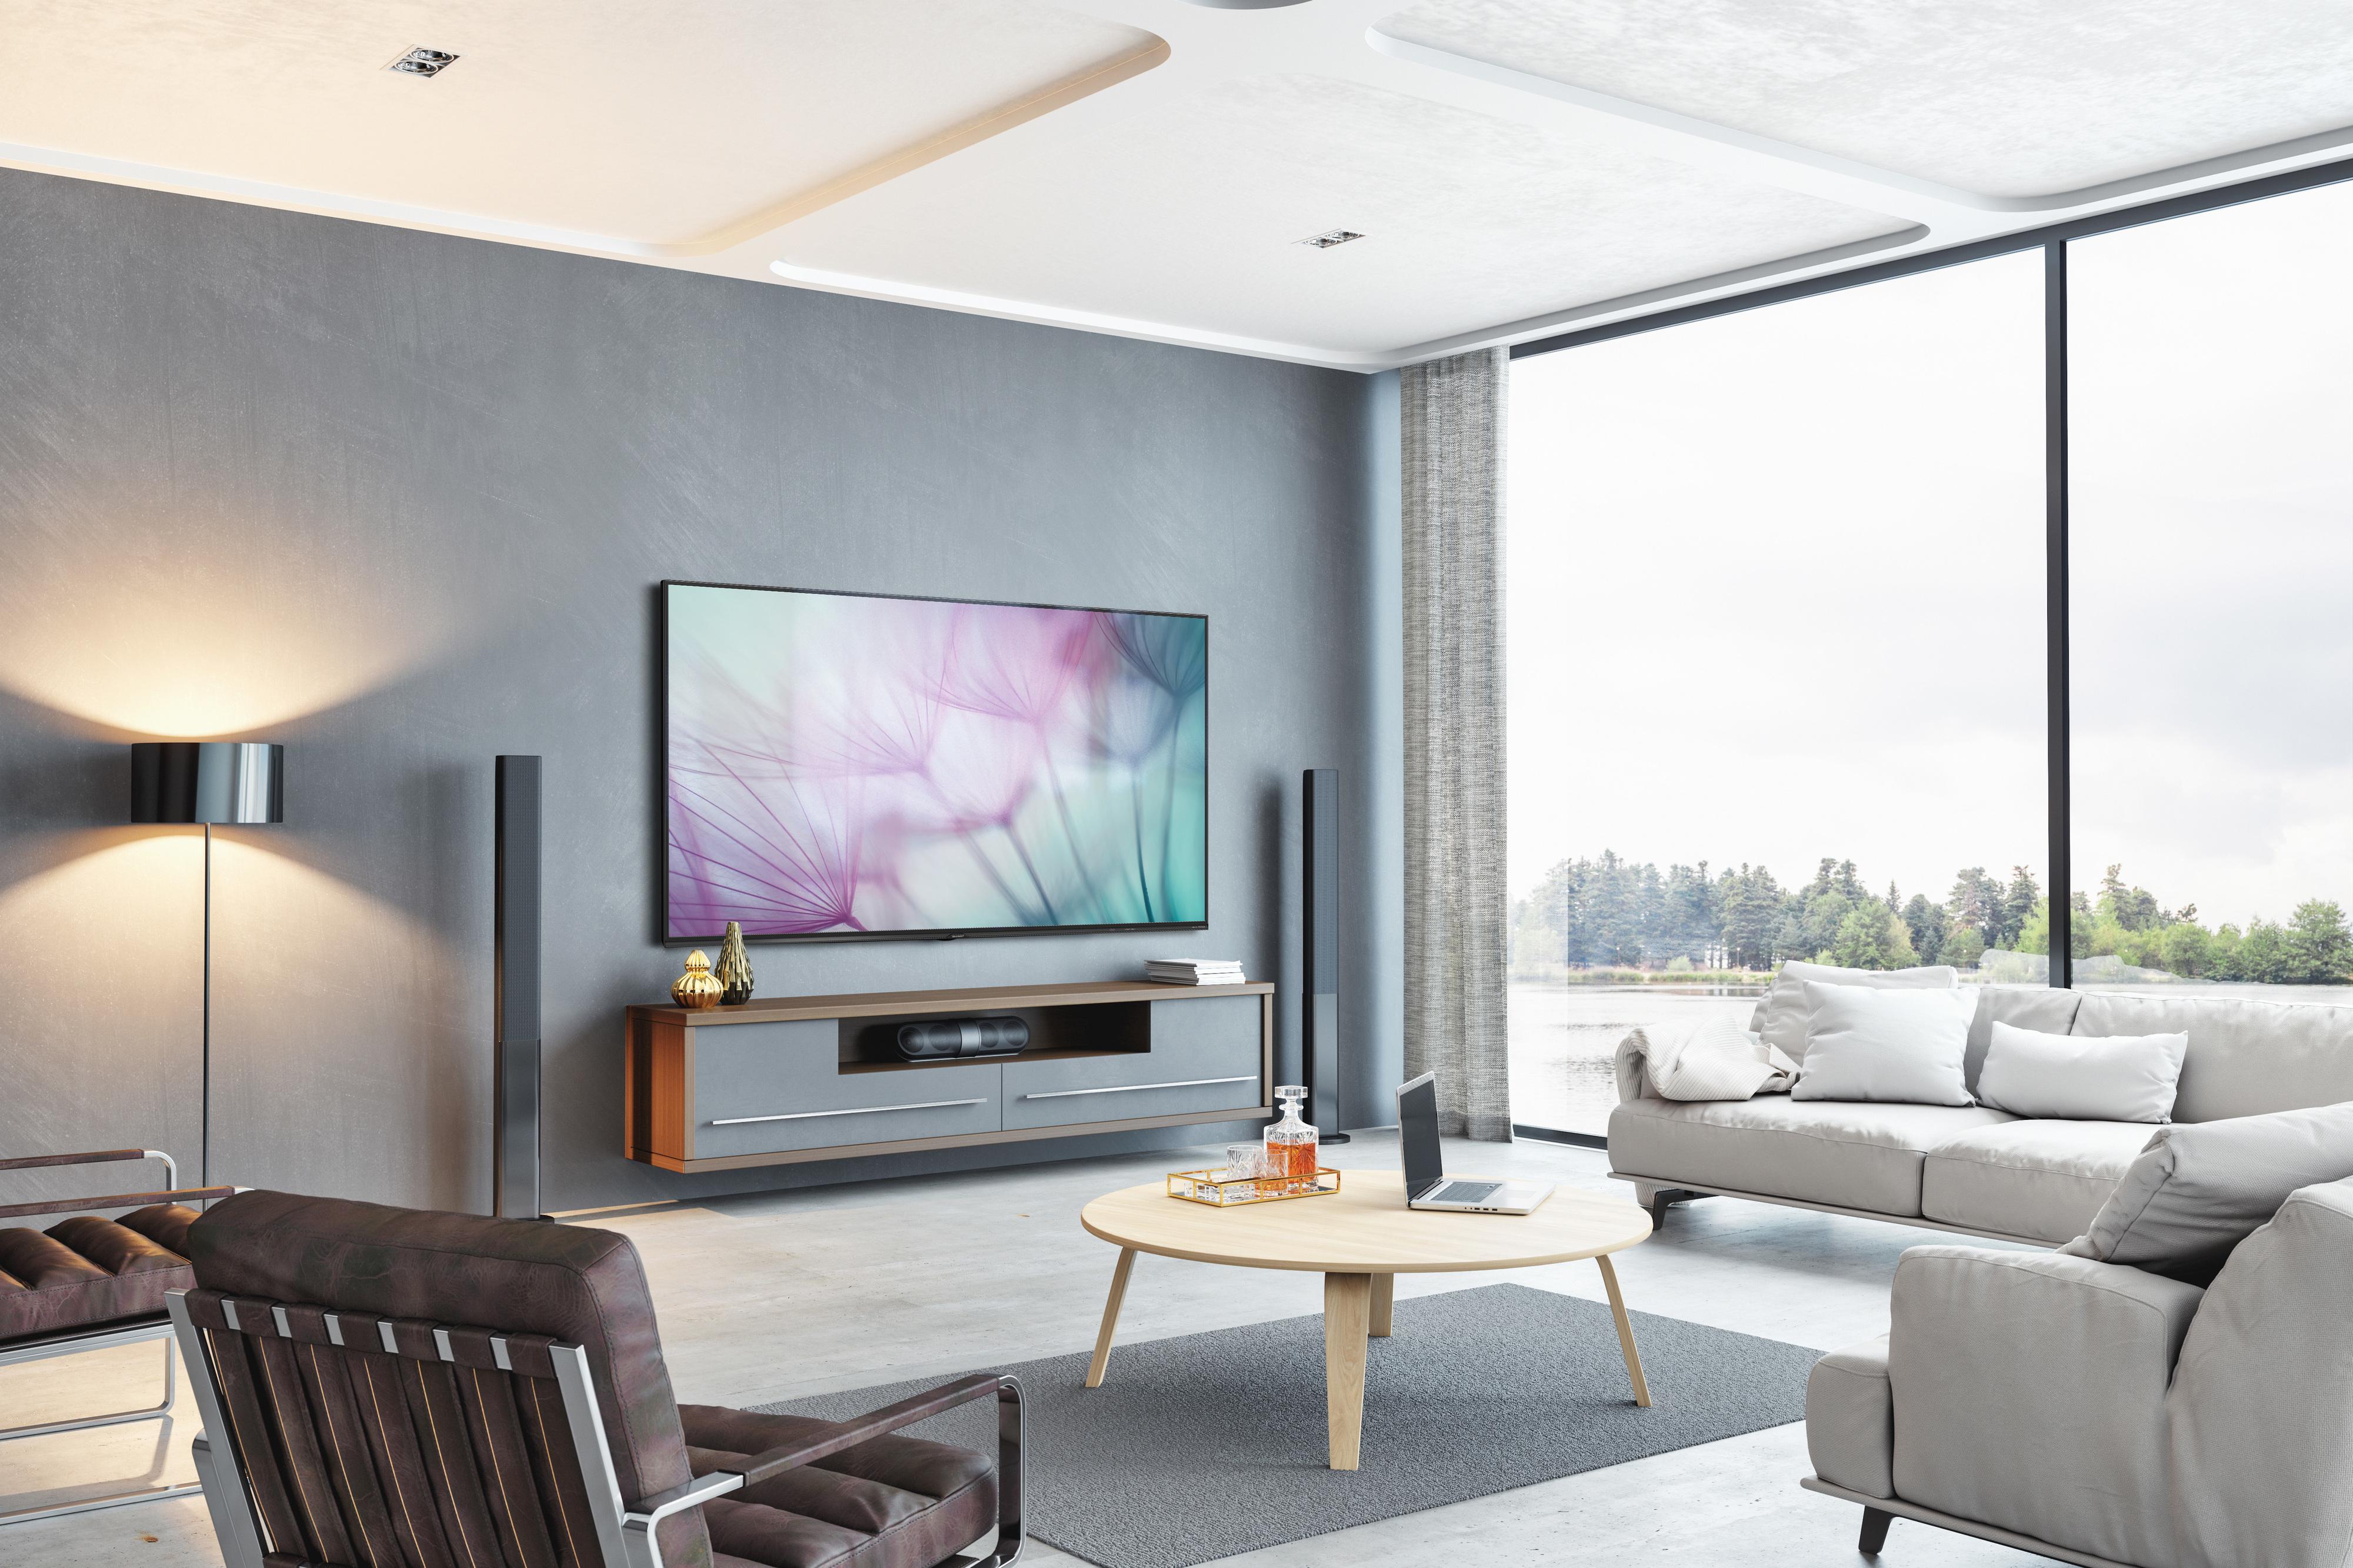 Sharp aposta nos televisores 8K e traz primeiro modelo para a Europa já este mês